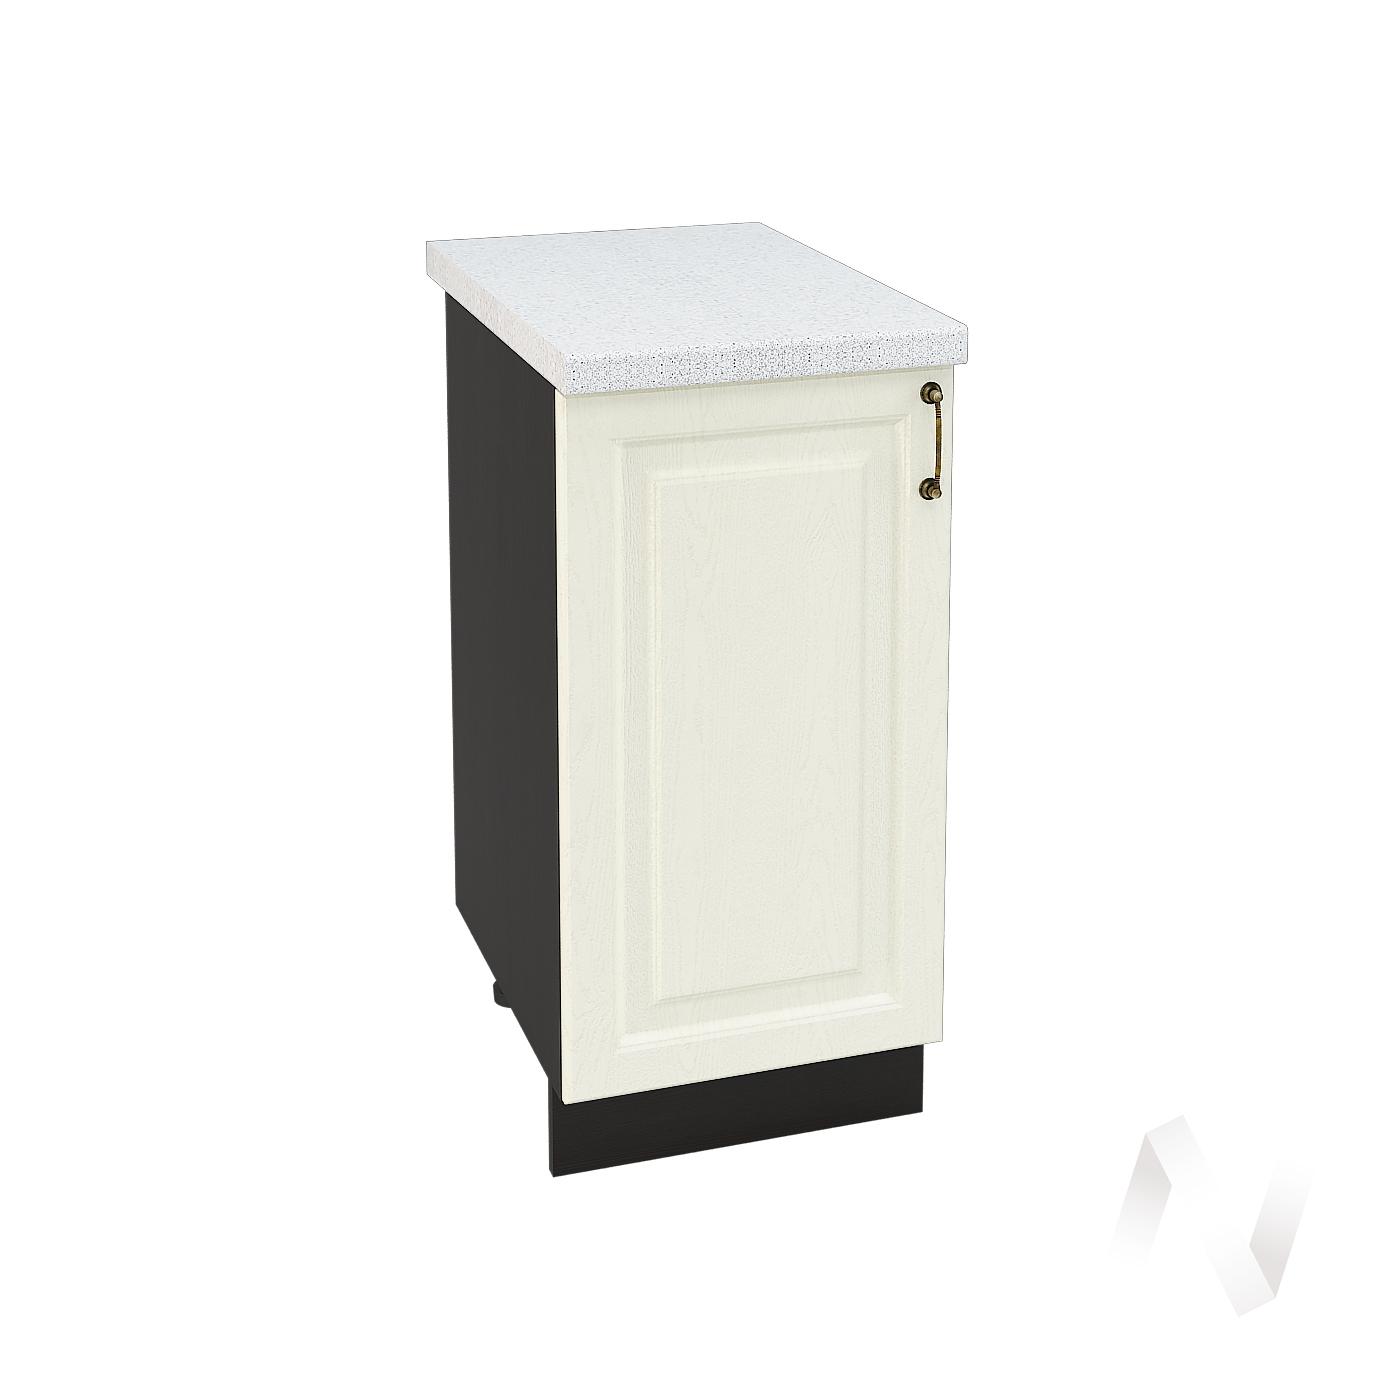 "Кухня ""Ницца"": Шкаф нижний 400, ШН 400 (Крем/корпус венге)"